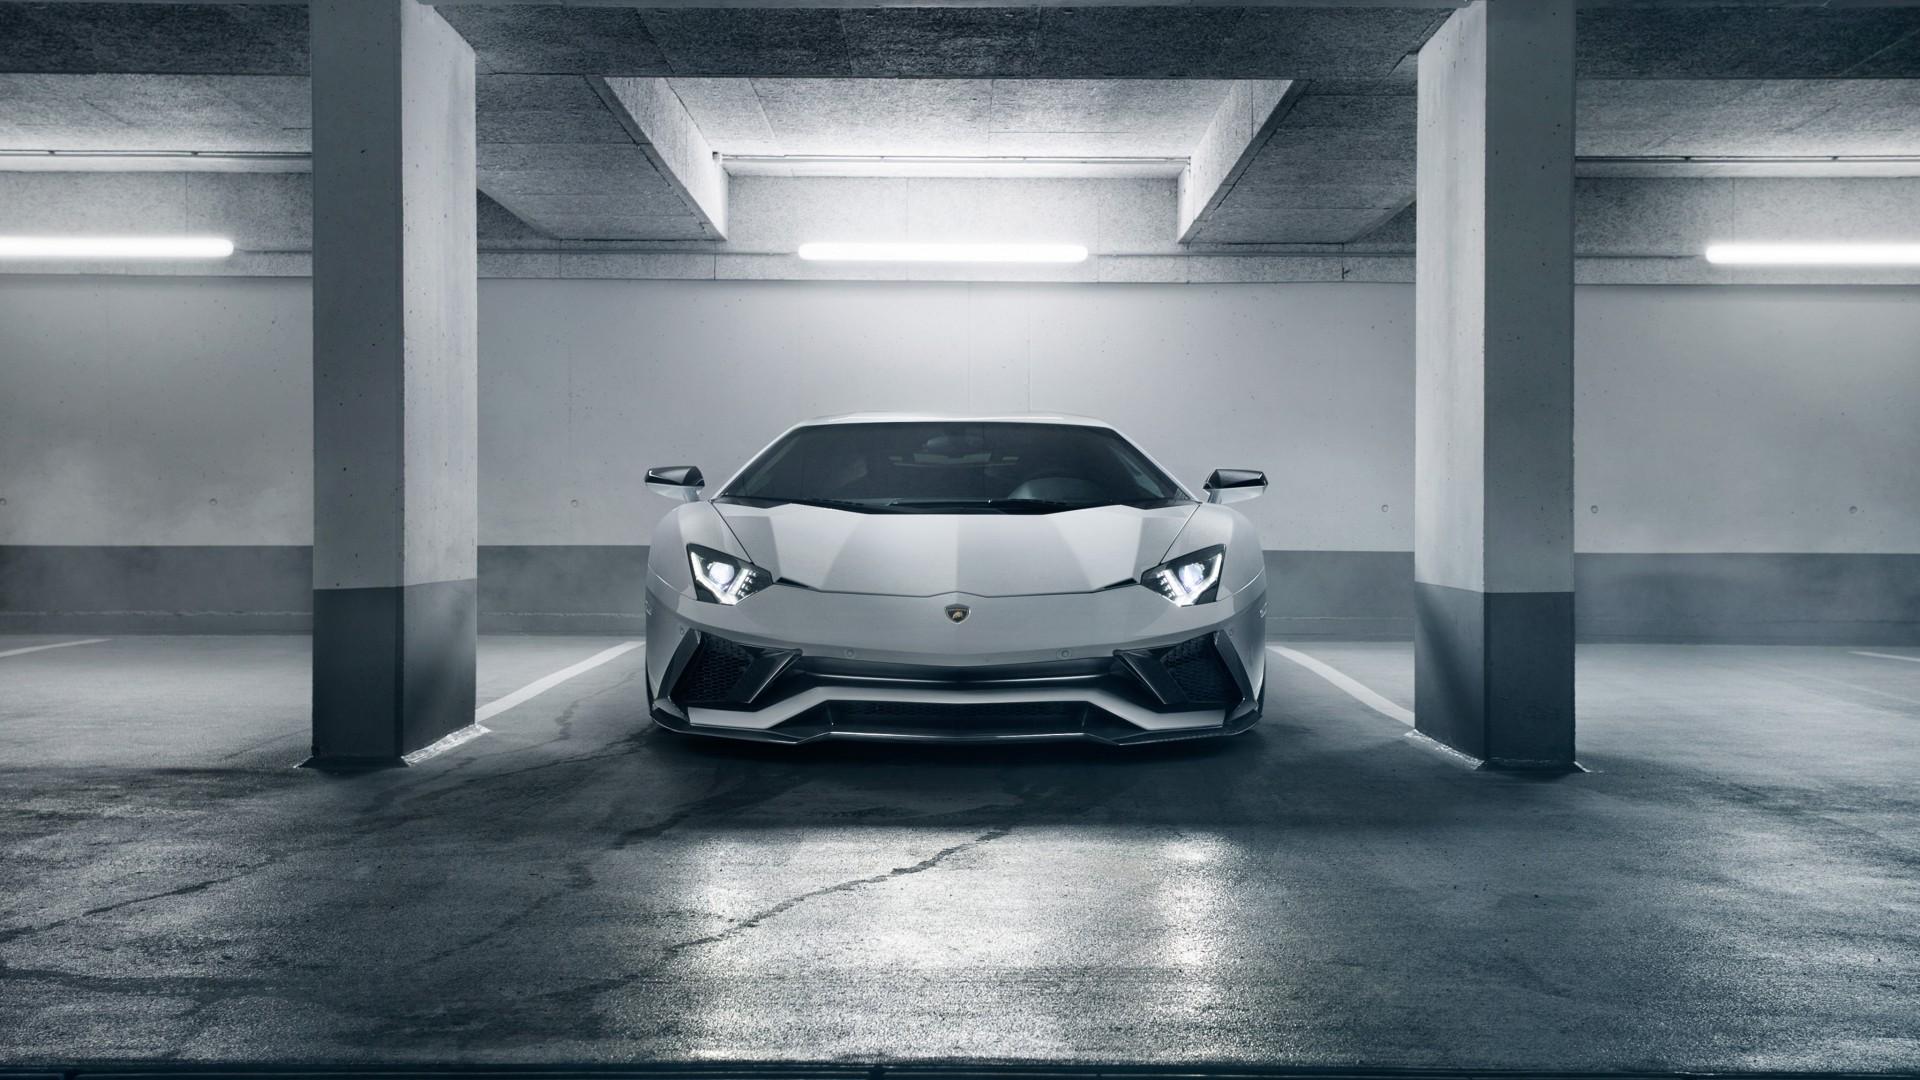 Lamborghini Aventador Garage Wallpaper 66274